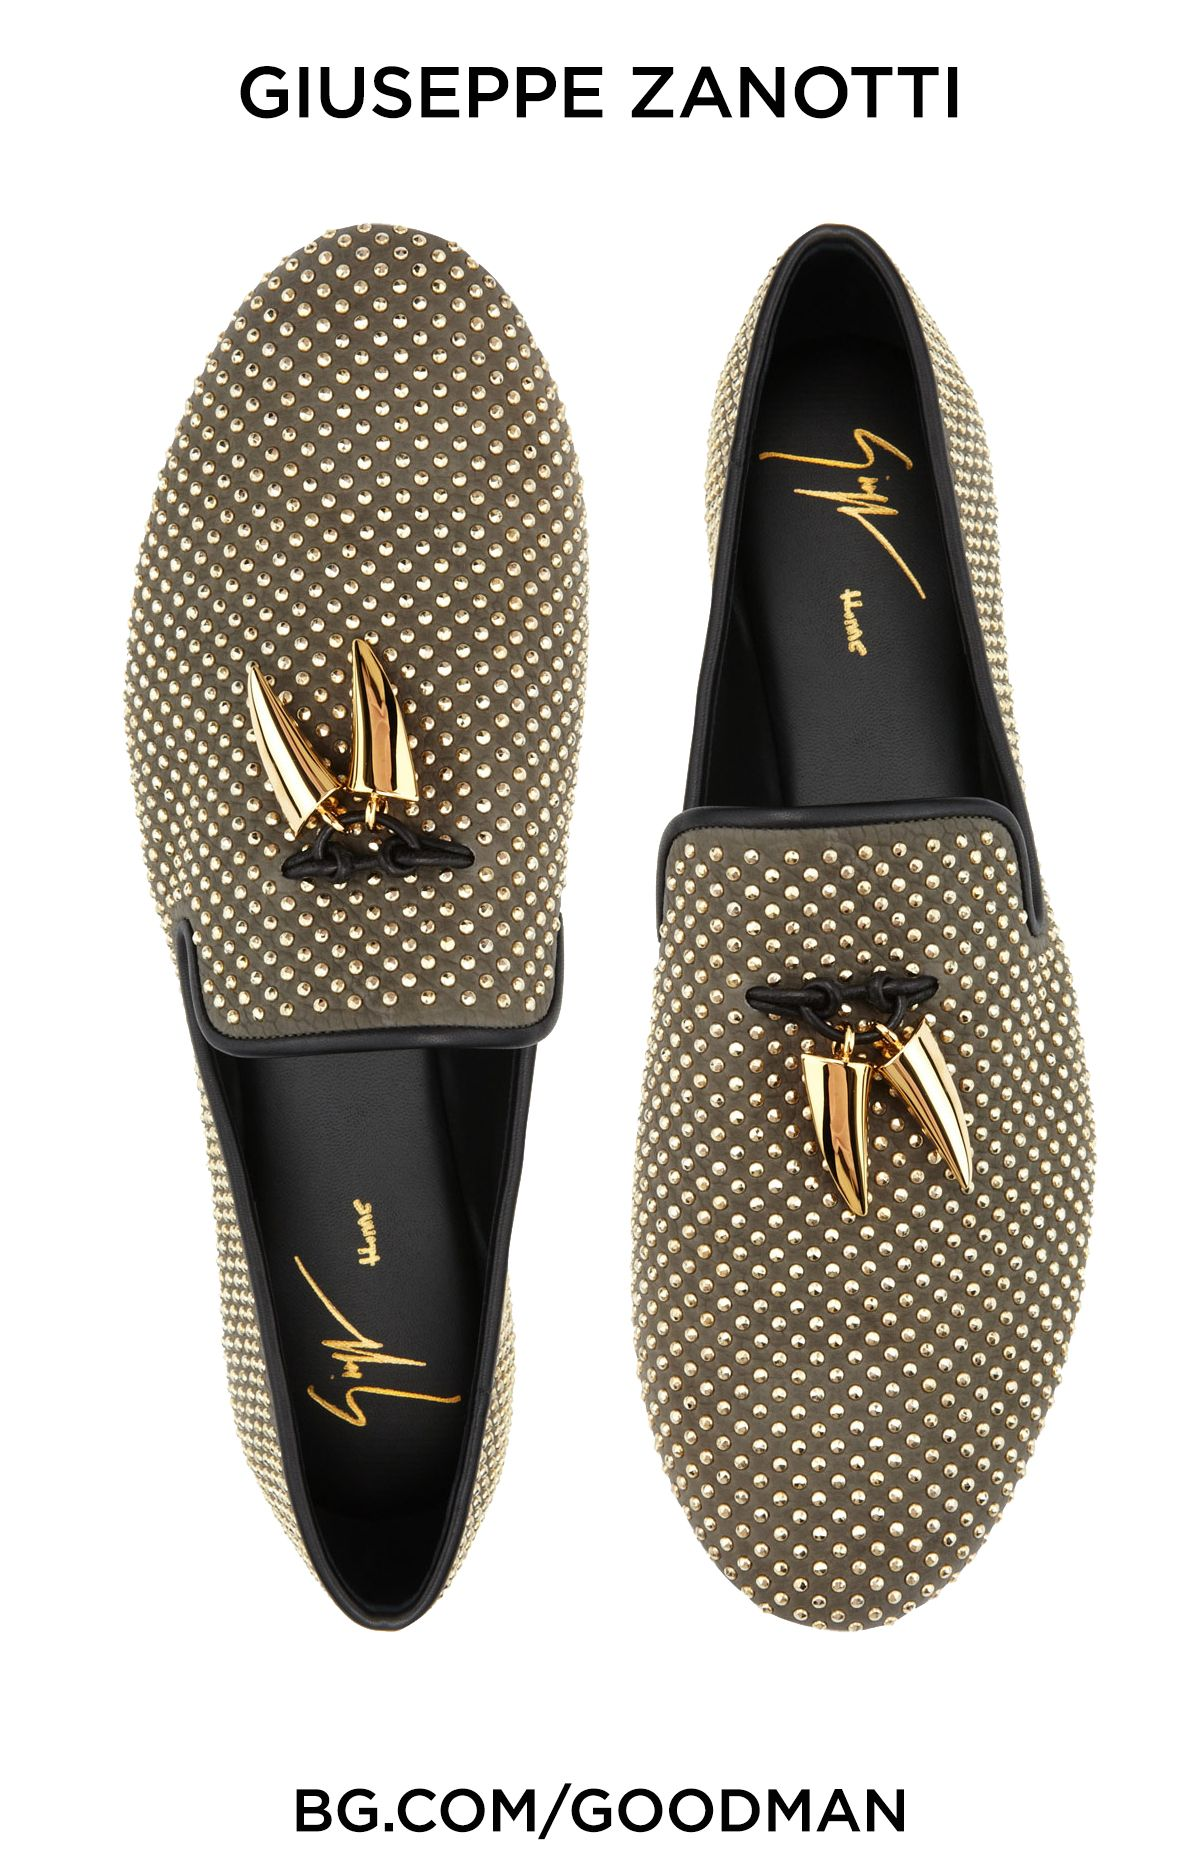 5efe166842e Giuseppe Zanotti presents a new kind of smoking slipper. 212 339 3343